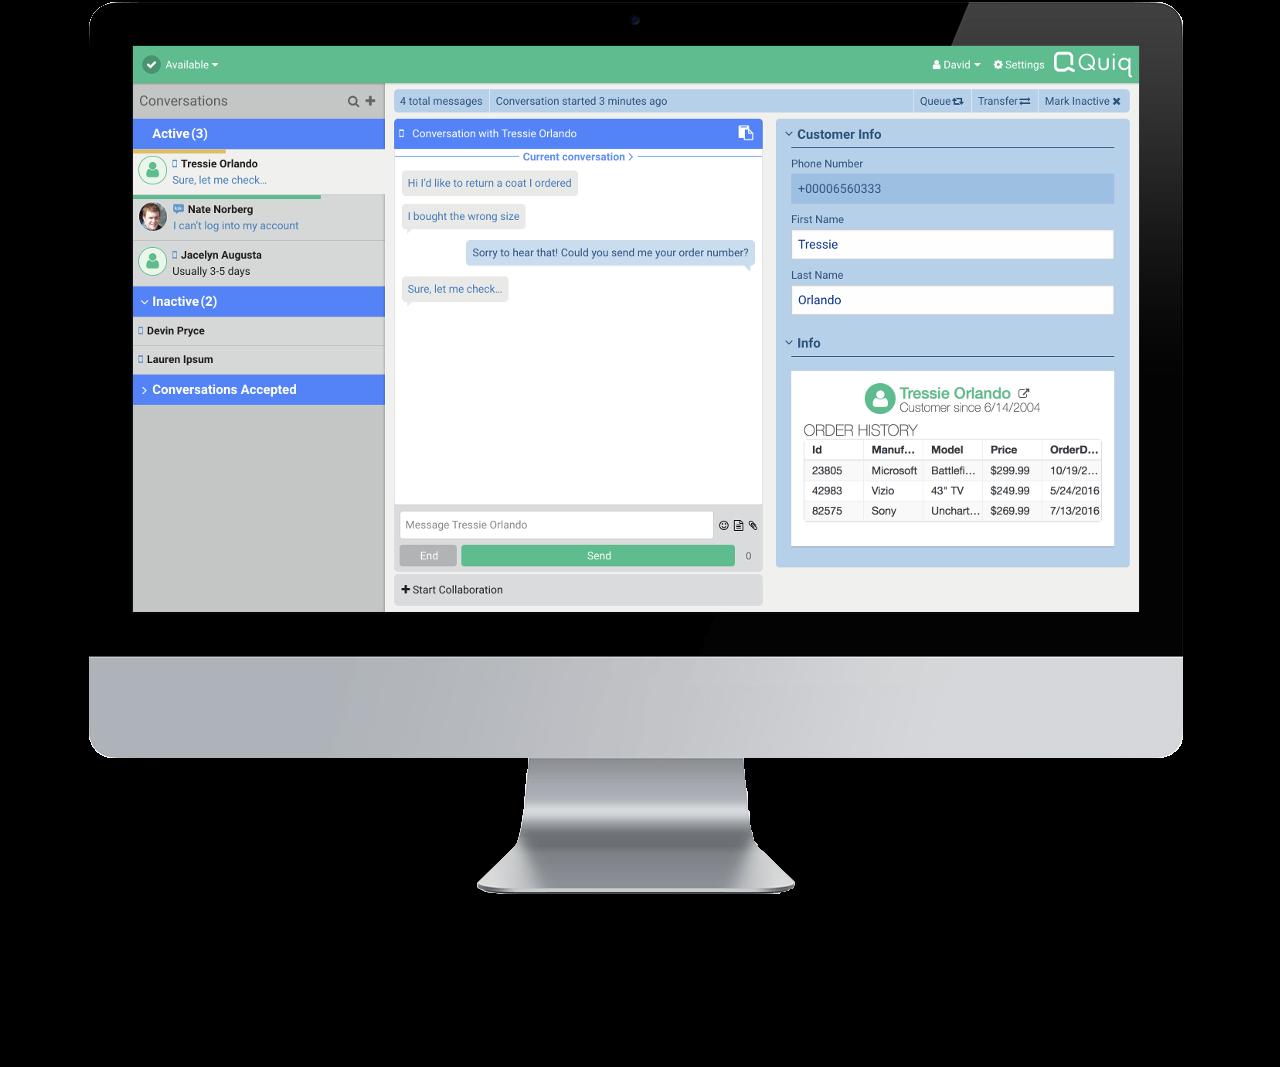 Quiq customer messaging agent workspace displayed on computer desktop